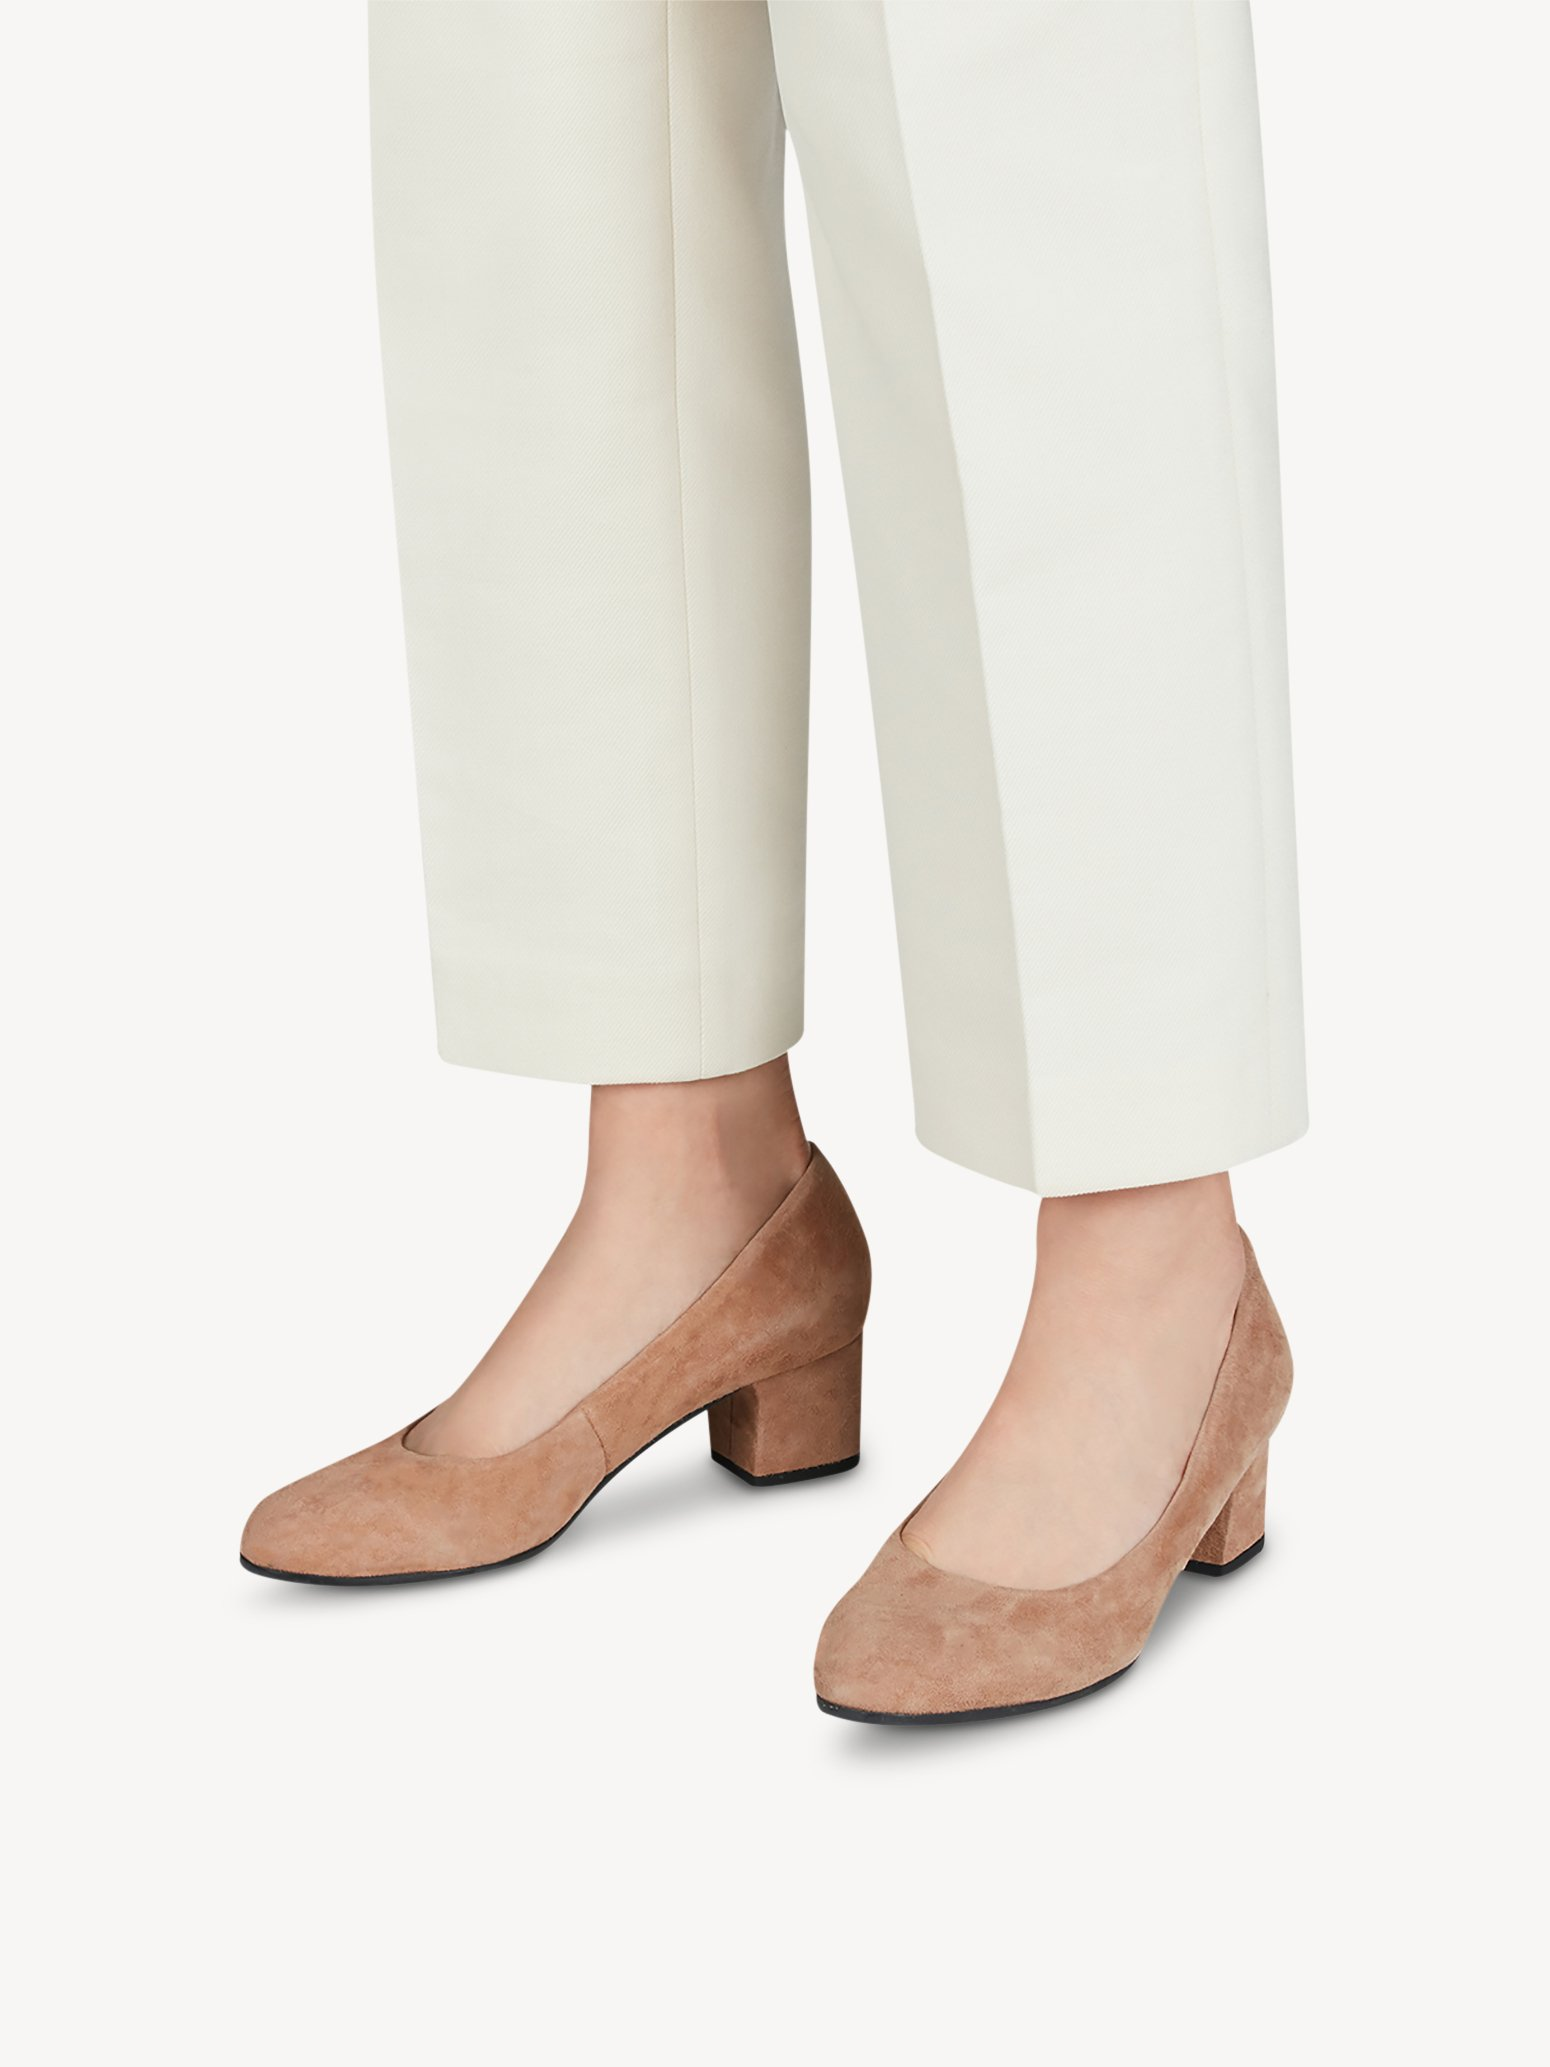 Туфли лодочки Tamaris 1-1-22302-25-375